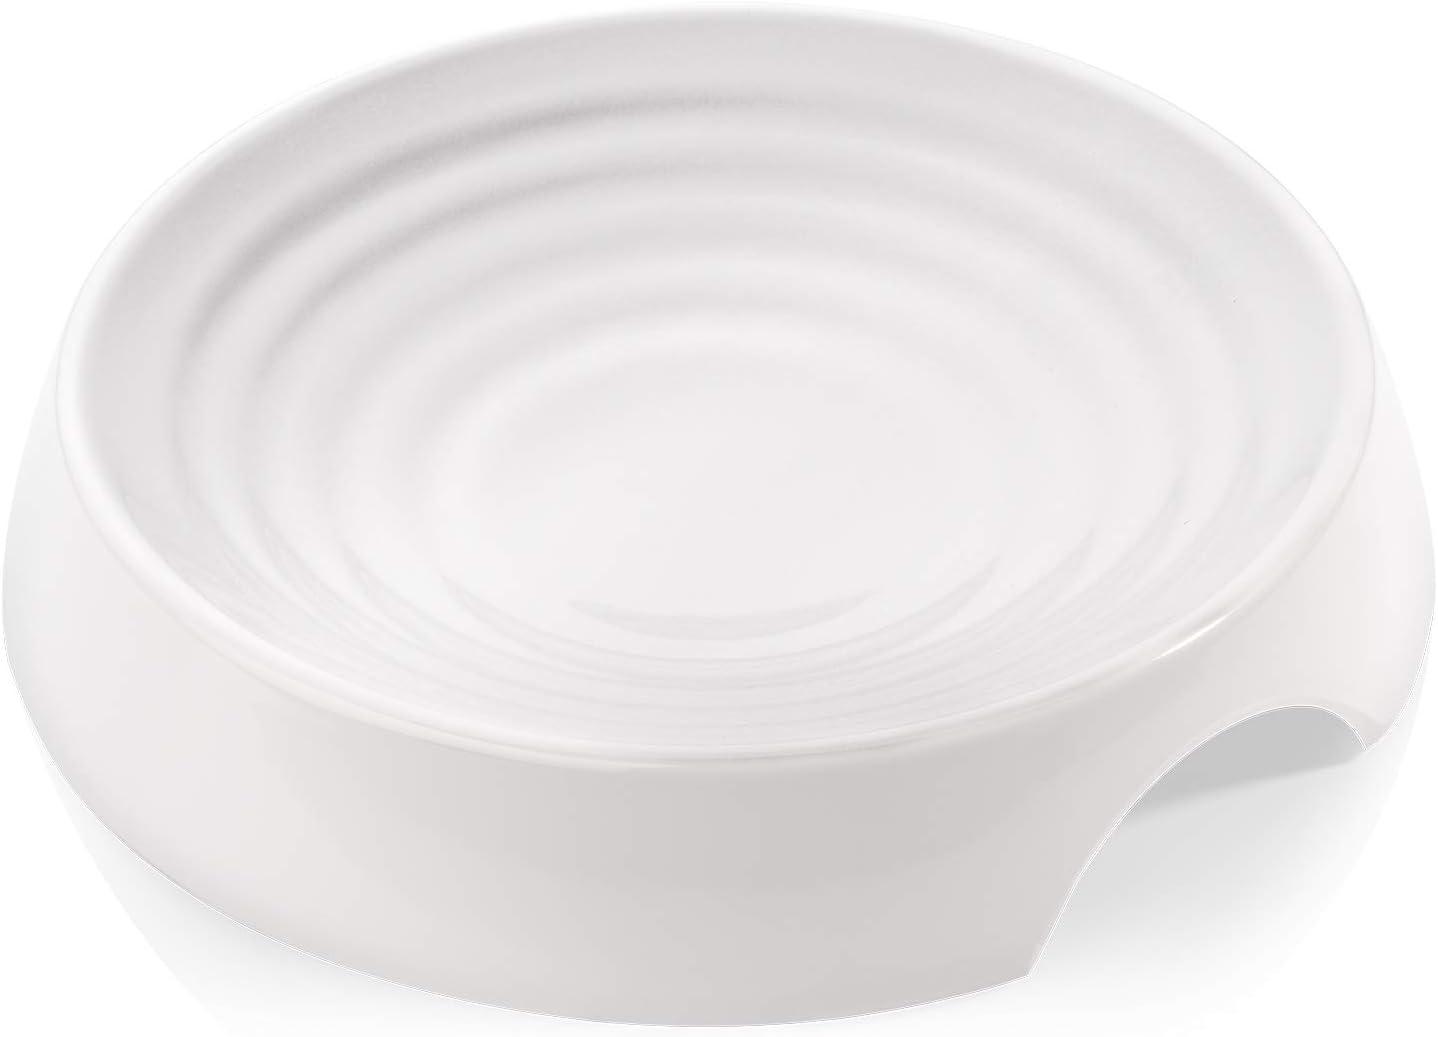 cat water dish cat feeding bowls cat feeder Cat bowls \u2013 Zebra Single stand cat waterer cat food bowls cat food stand Cat dishes